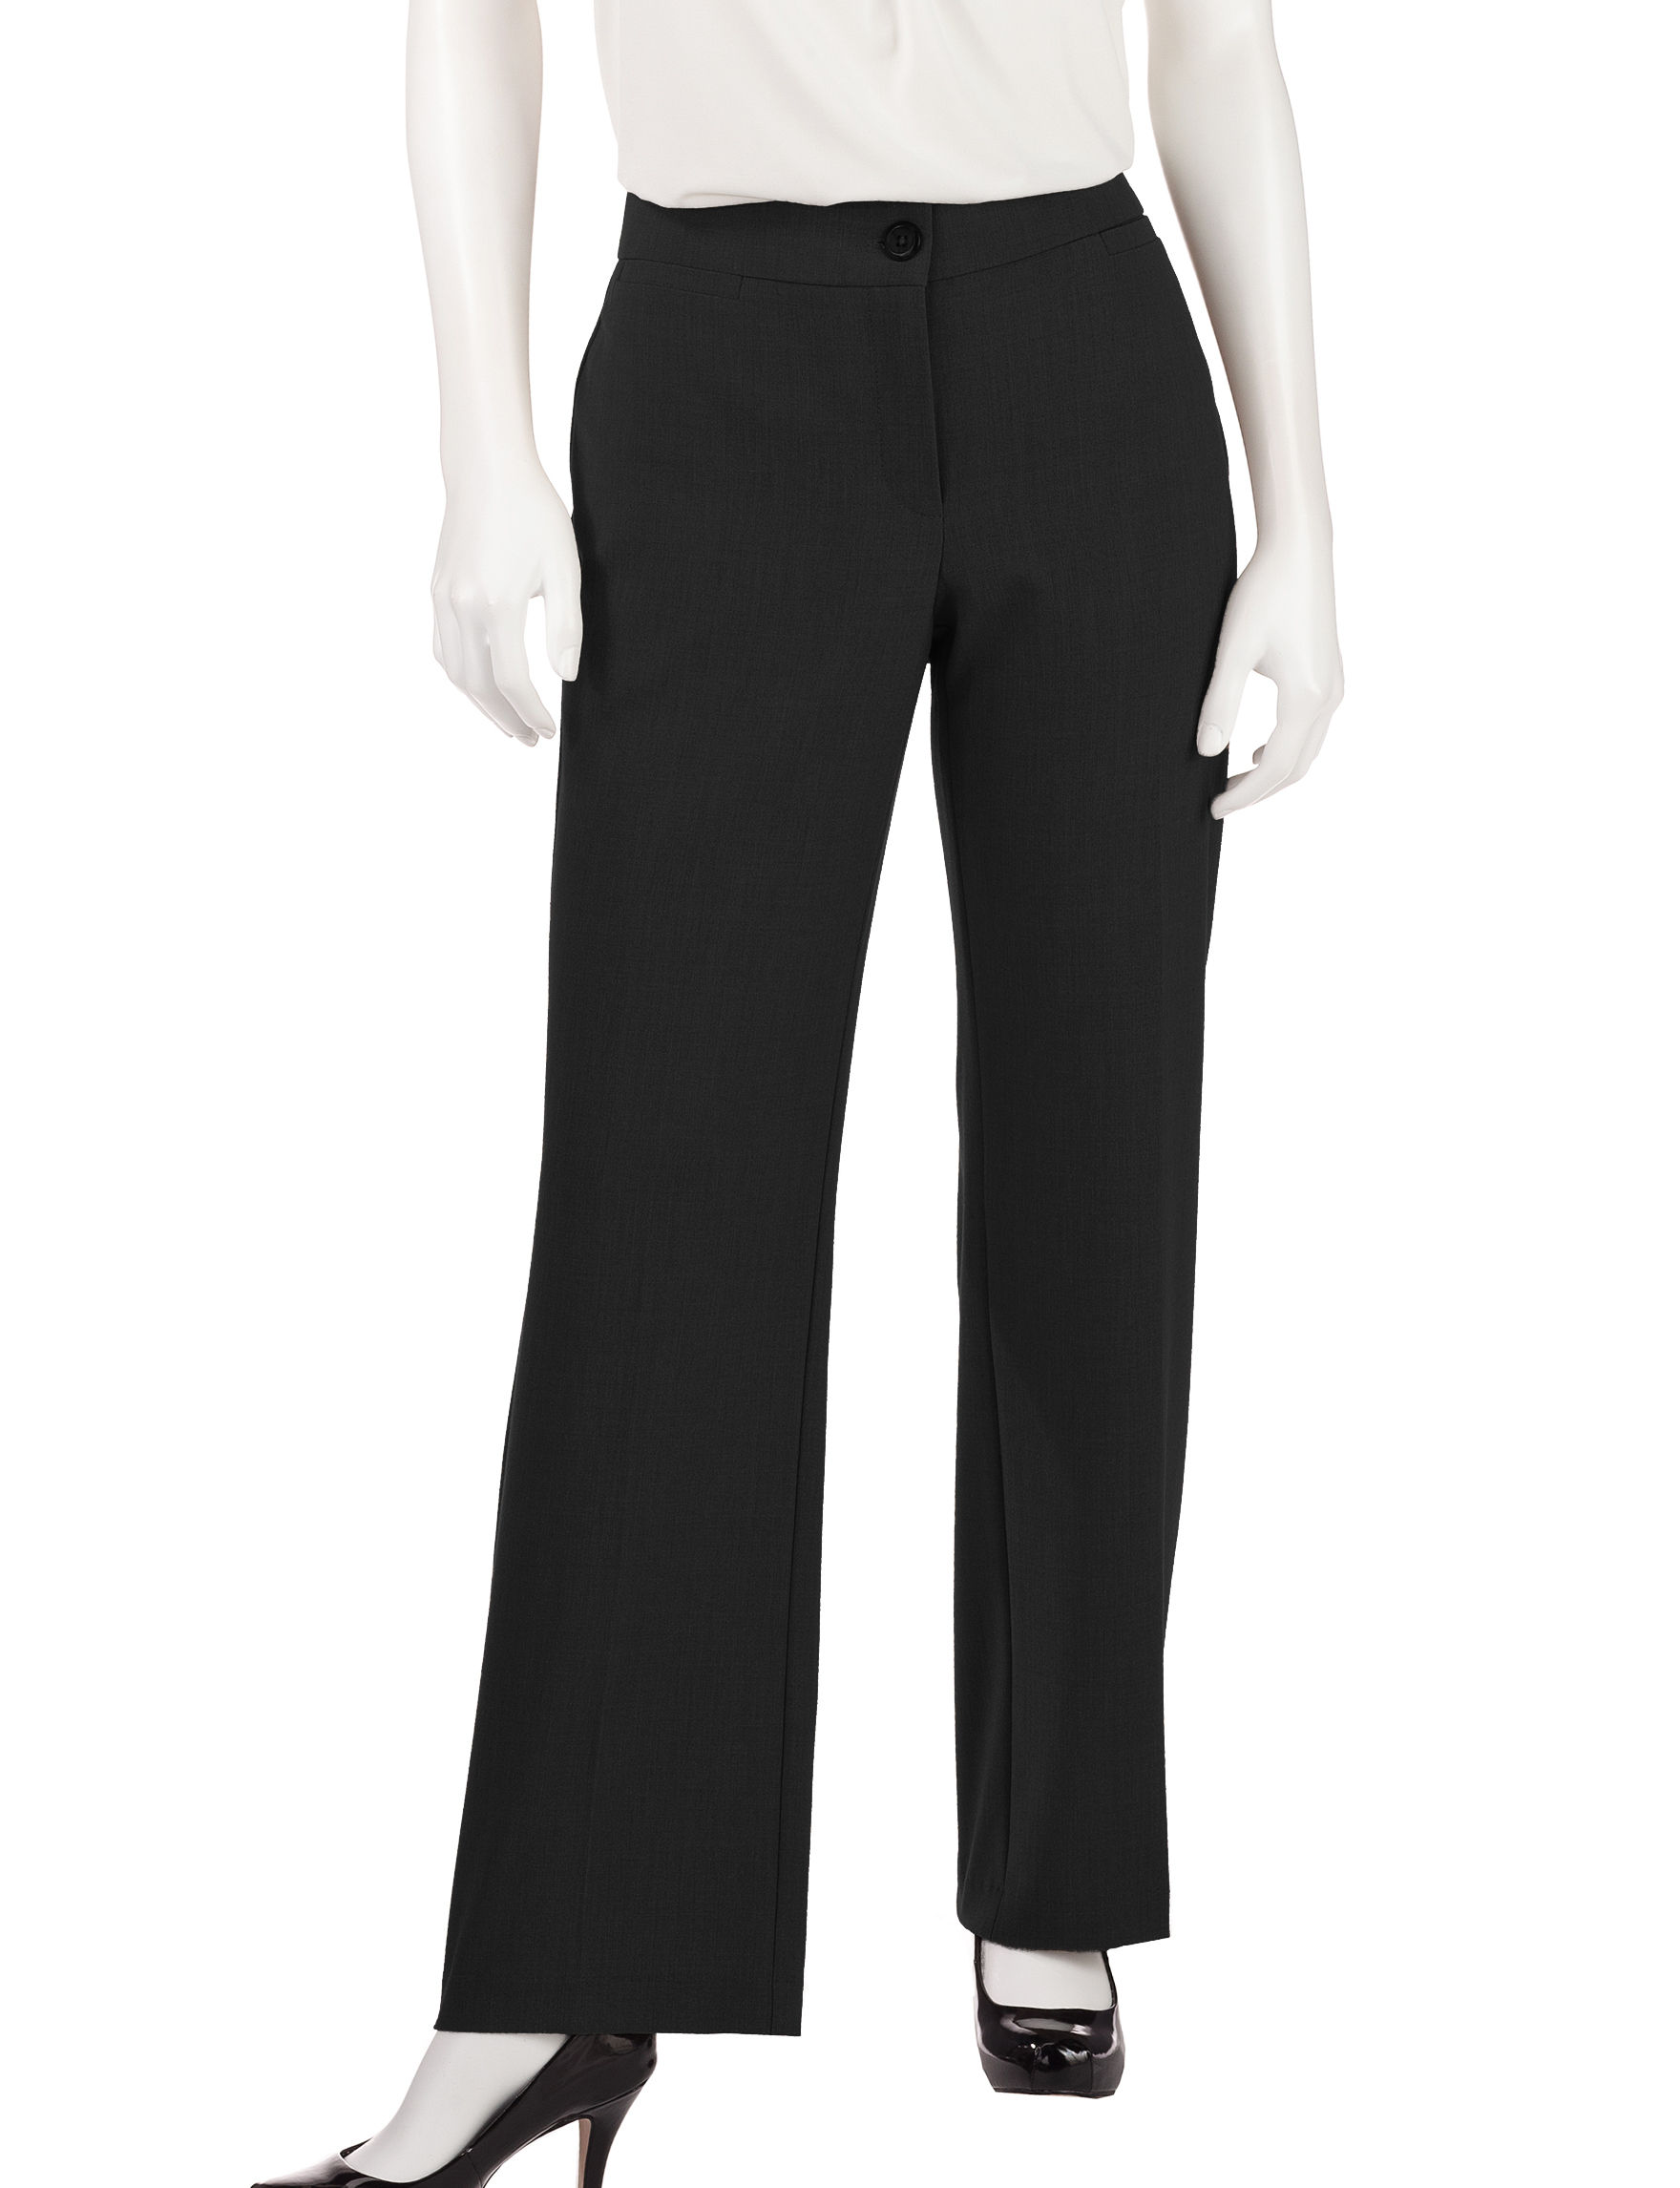 Briggs New York Petite Solid Color Bi-Stretch Pants - Black - 6P - Briggs New York